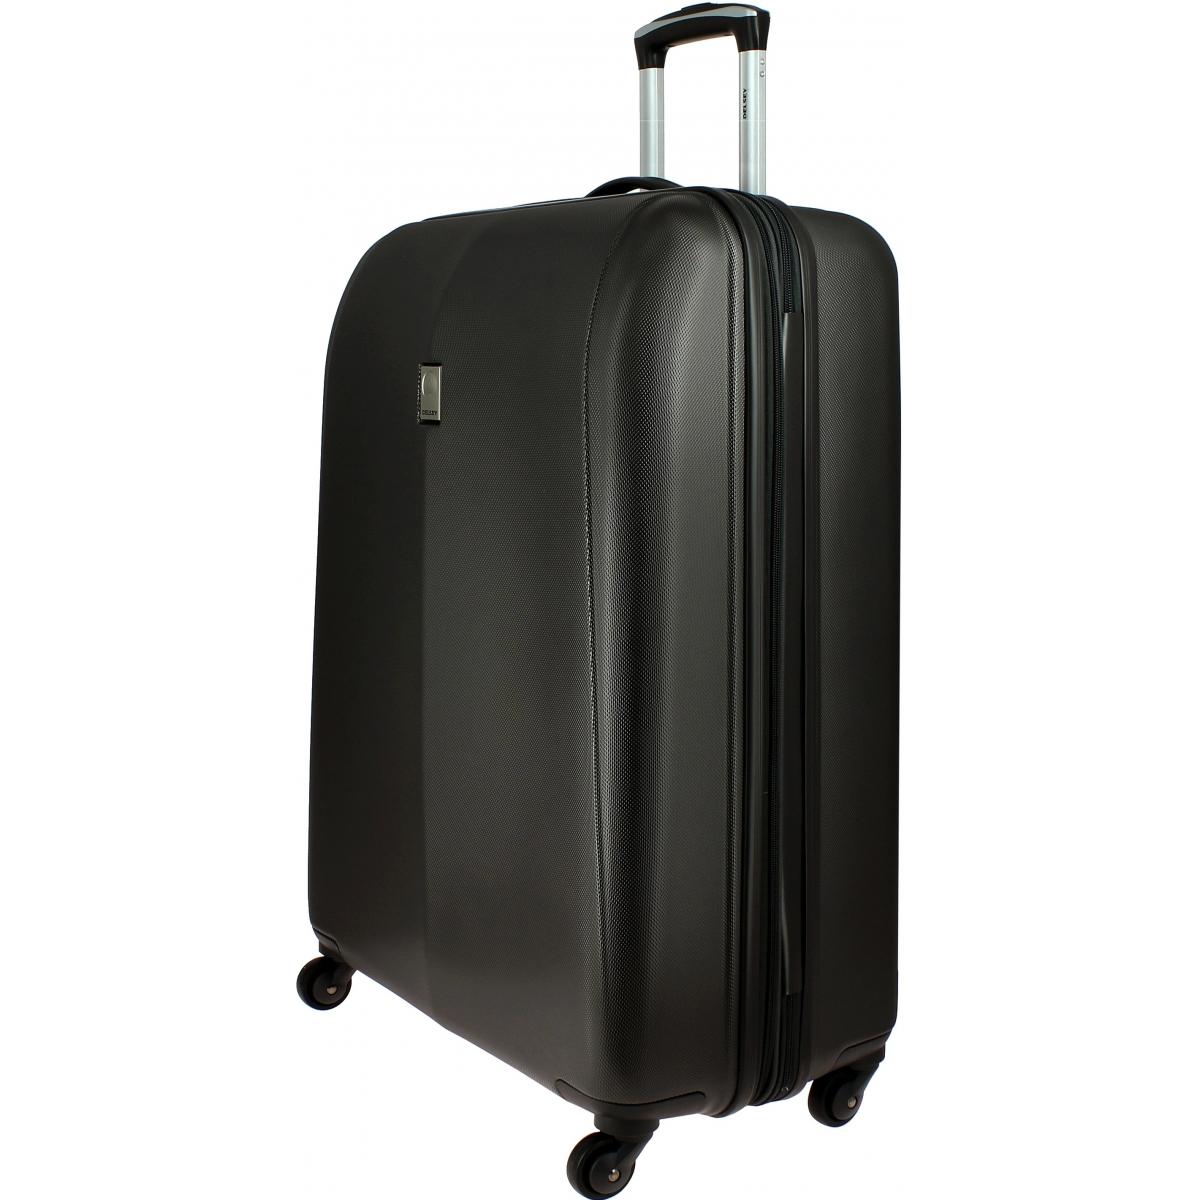 valise delsey extendo 67cm extendo810 couleur. Black Bedroom Furniture Sets. Home Design Ideas